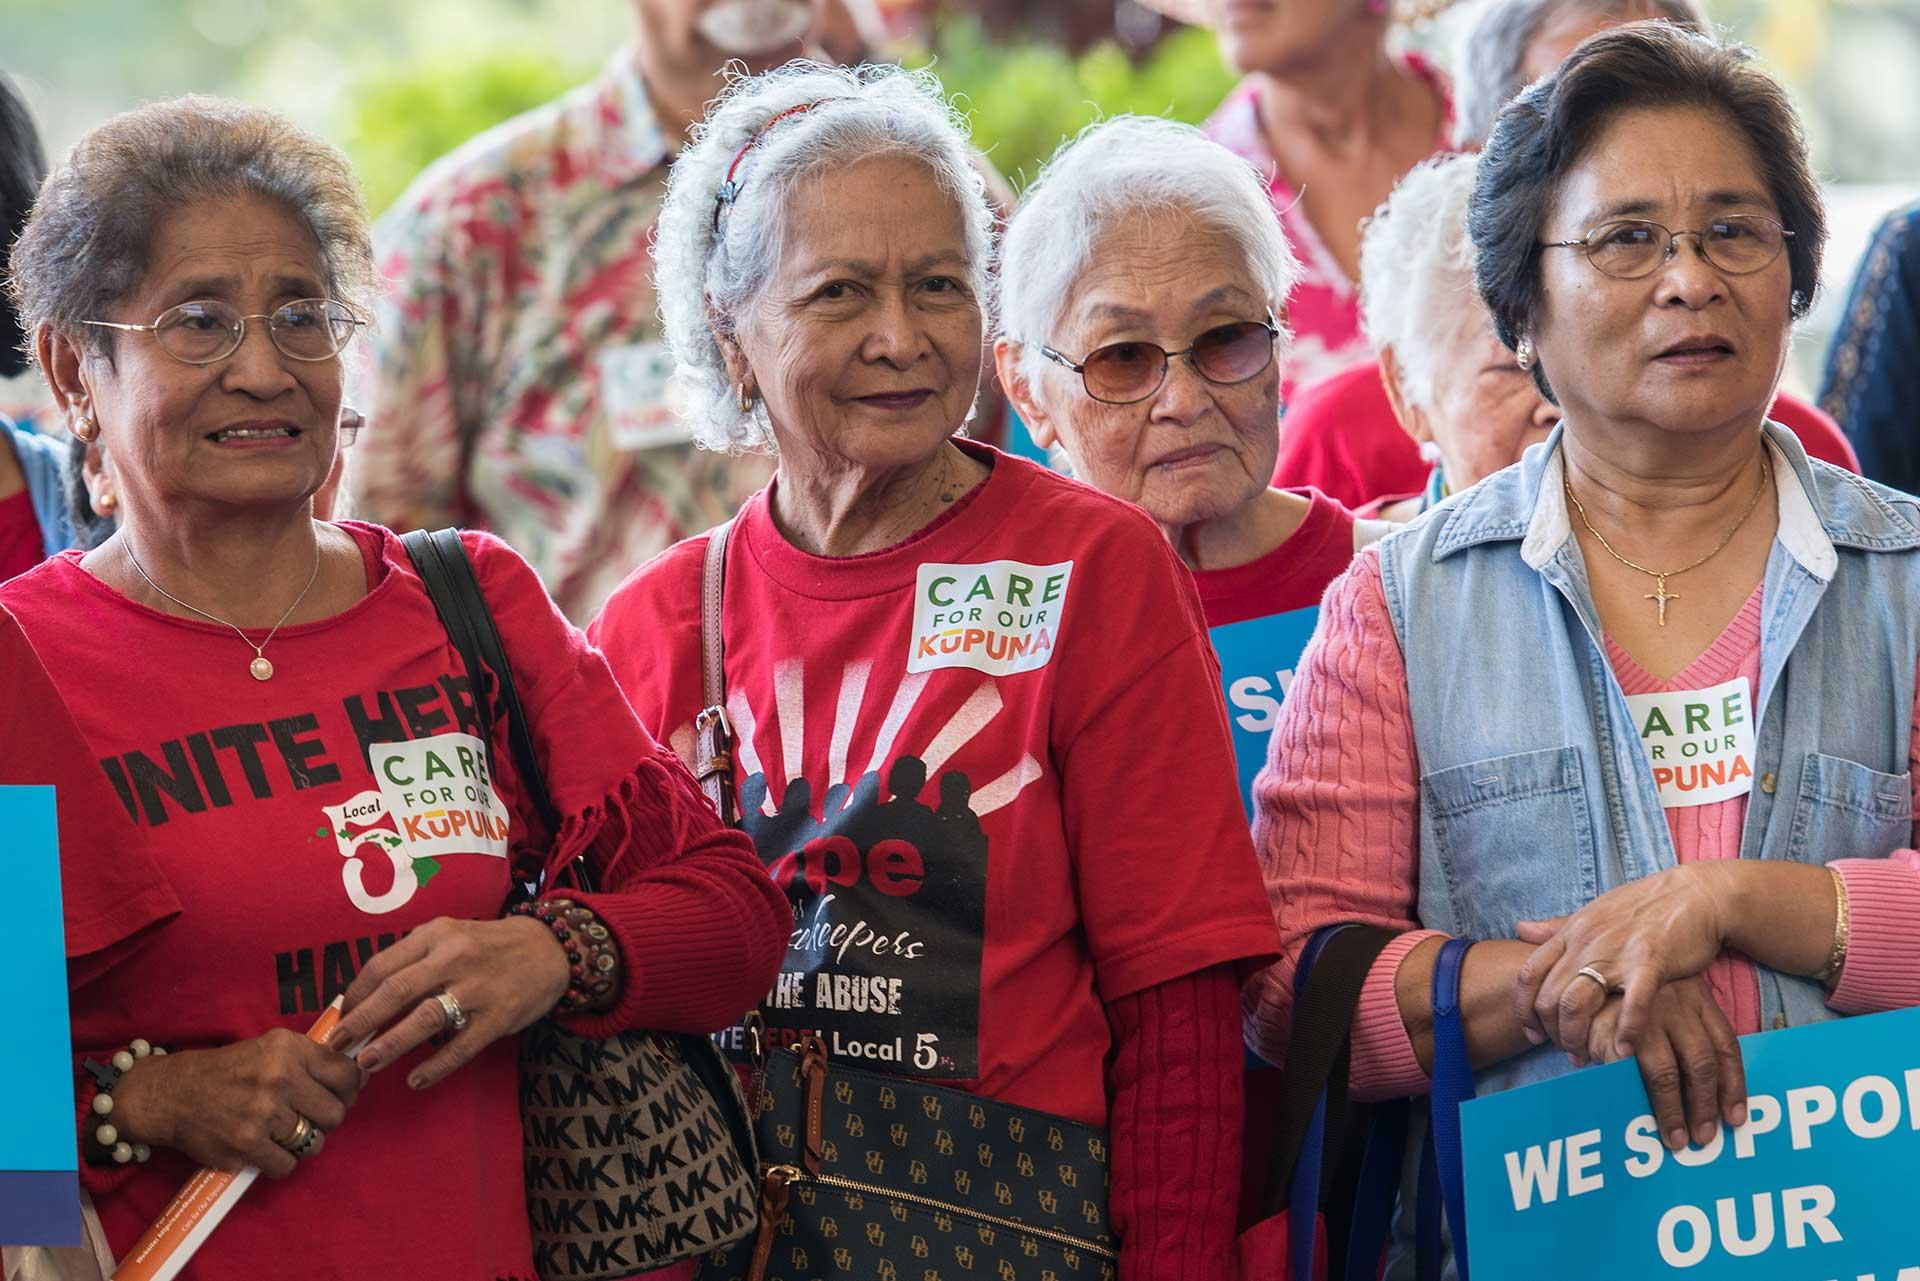 Kupuna Caregiver supporters